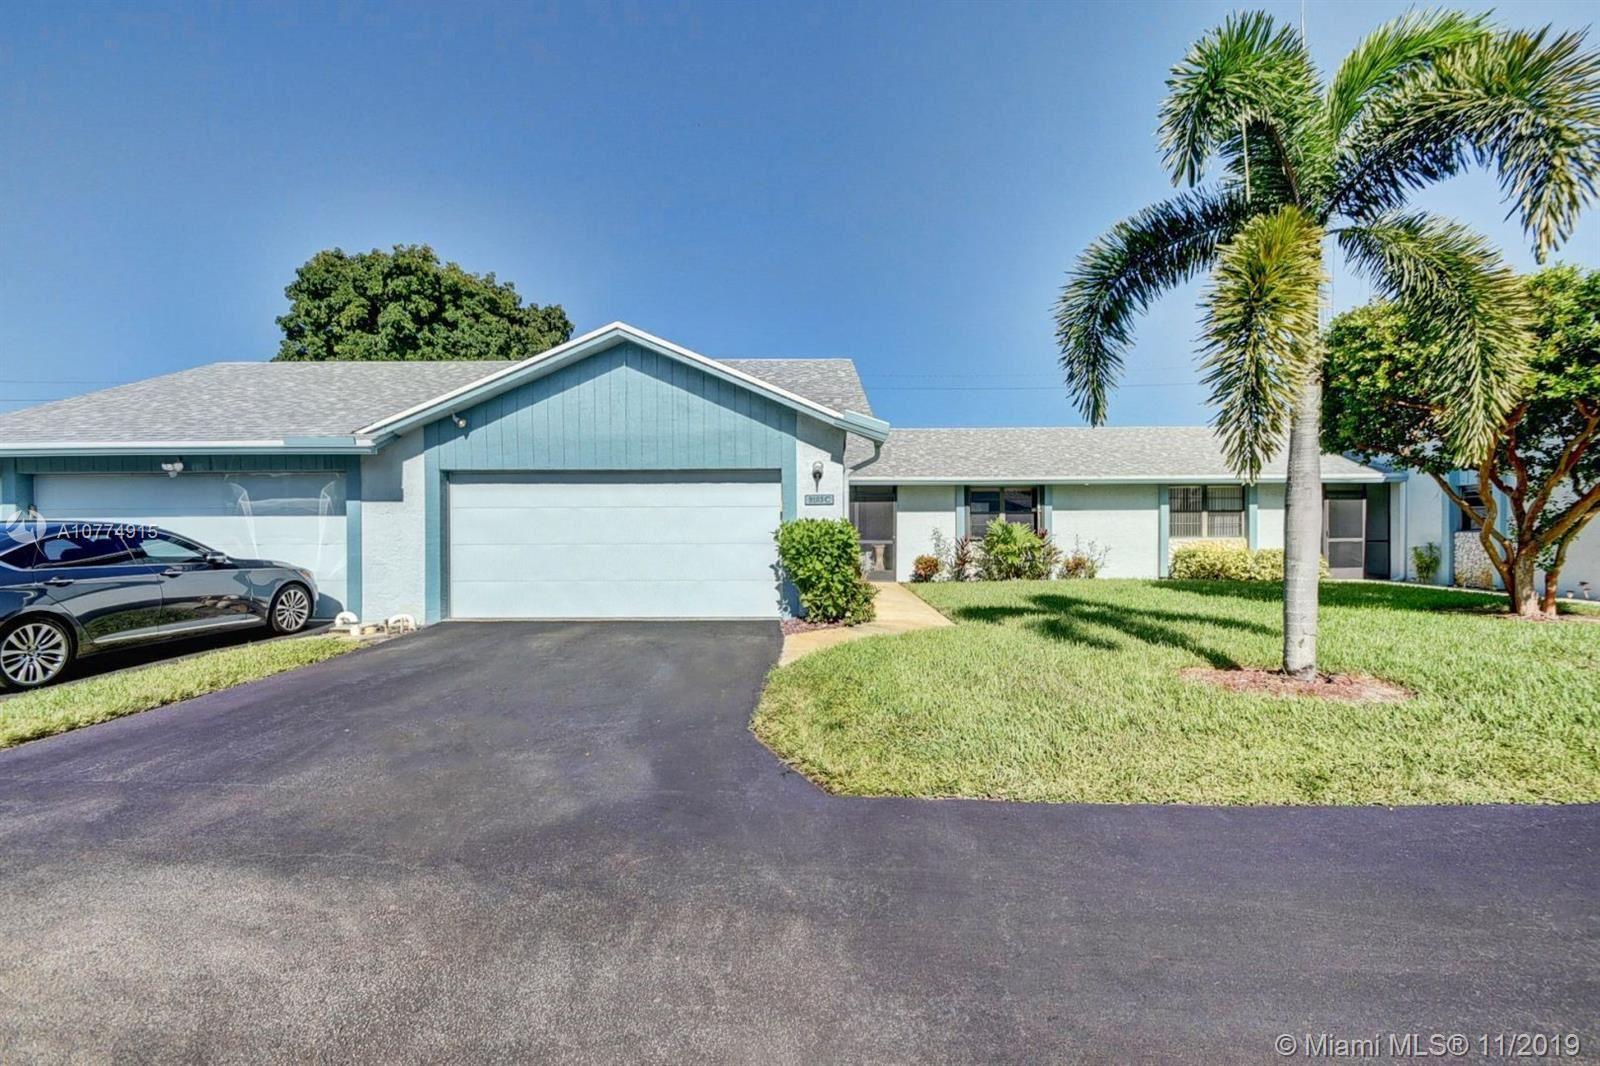 9103 SW 20TH ST #C, Boca Raton, FL 33428 - MLS#: A10774915